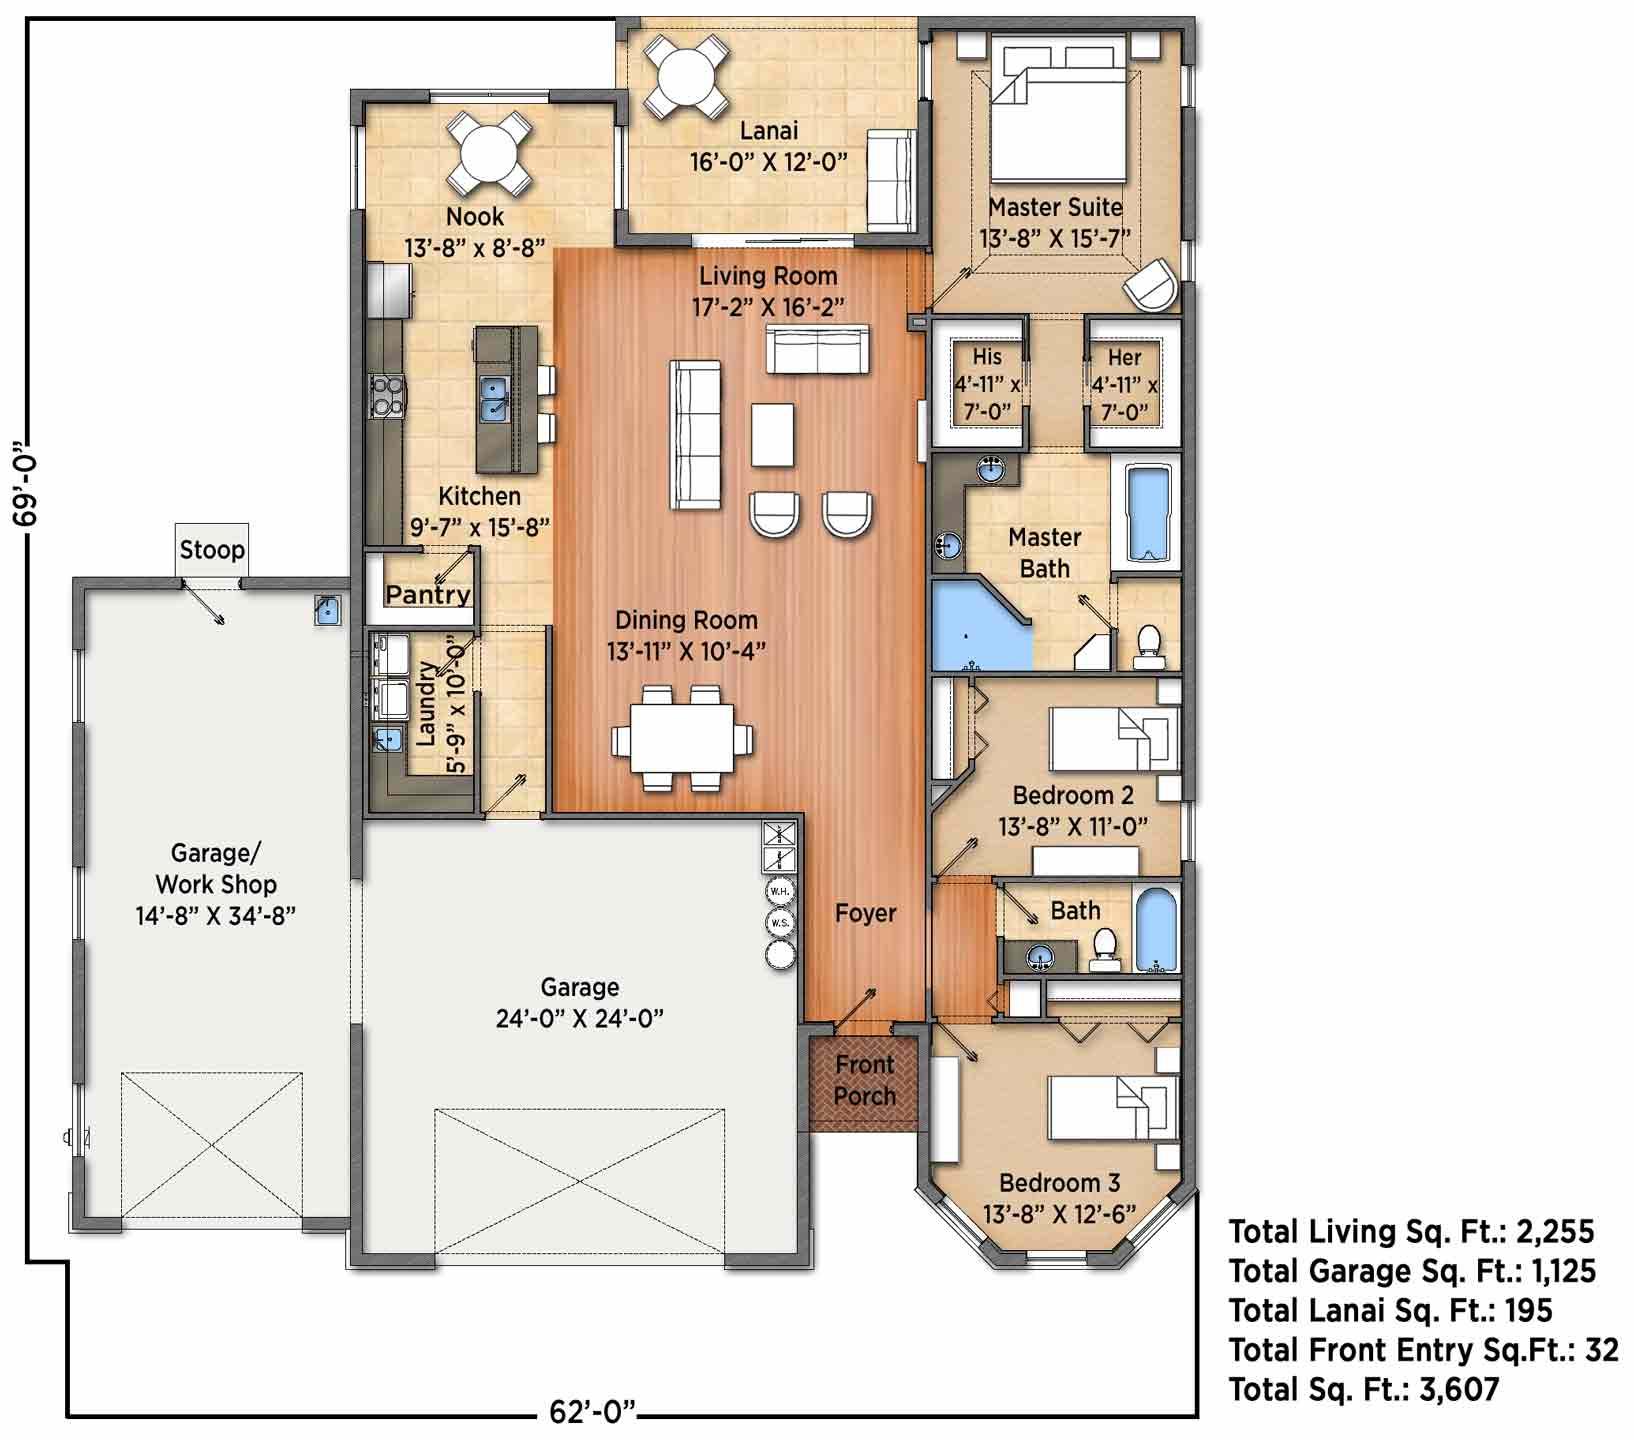 South Haven I Floorplan